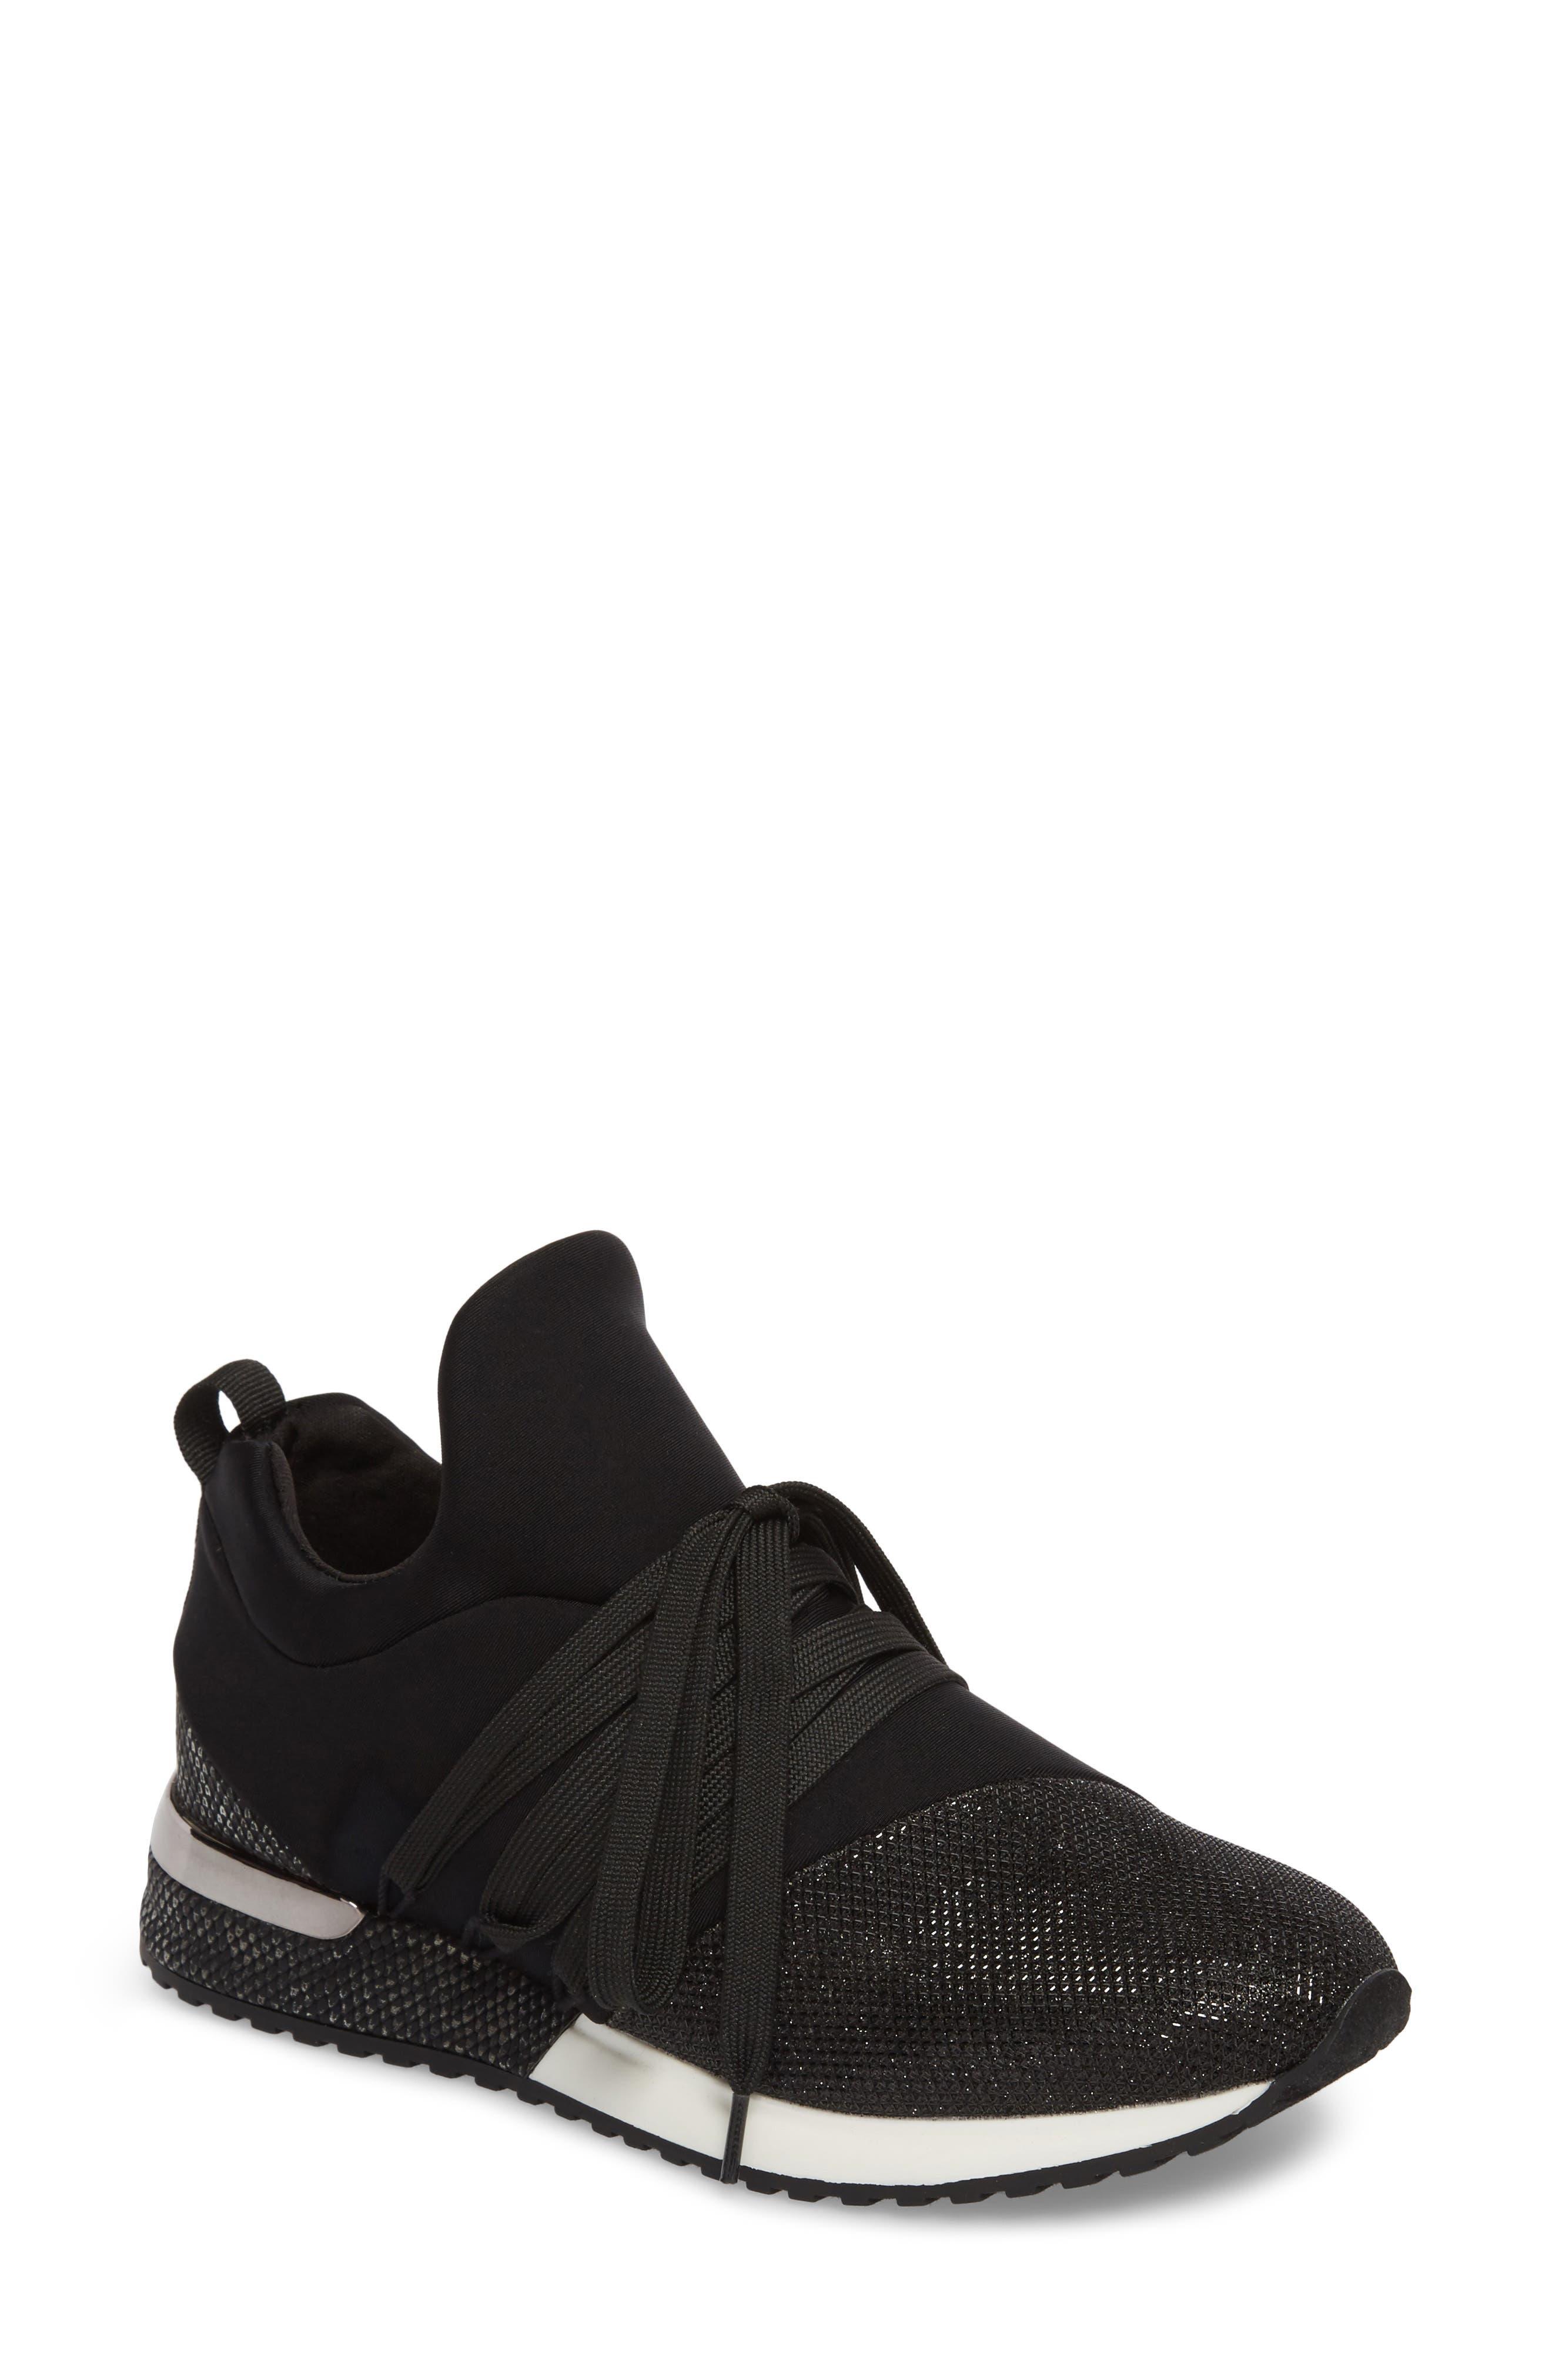 Alternate Image 1 Selected - JSlides Zorro Sneaker (Women)